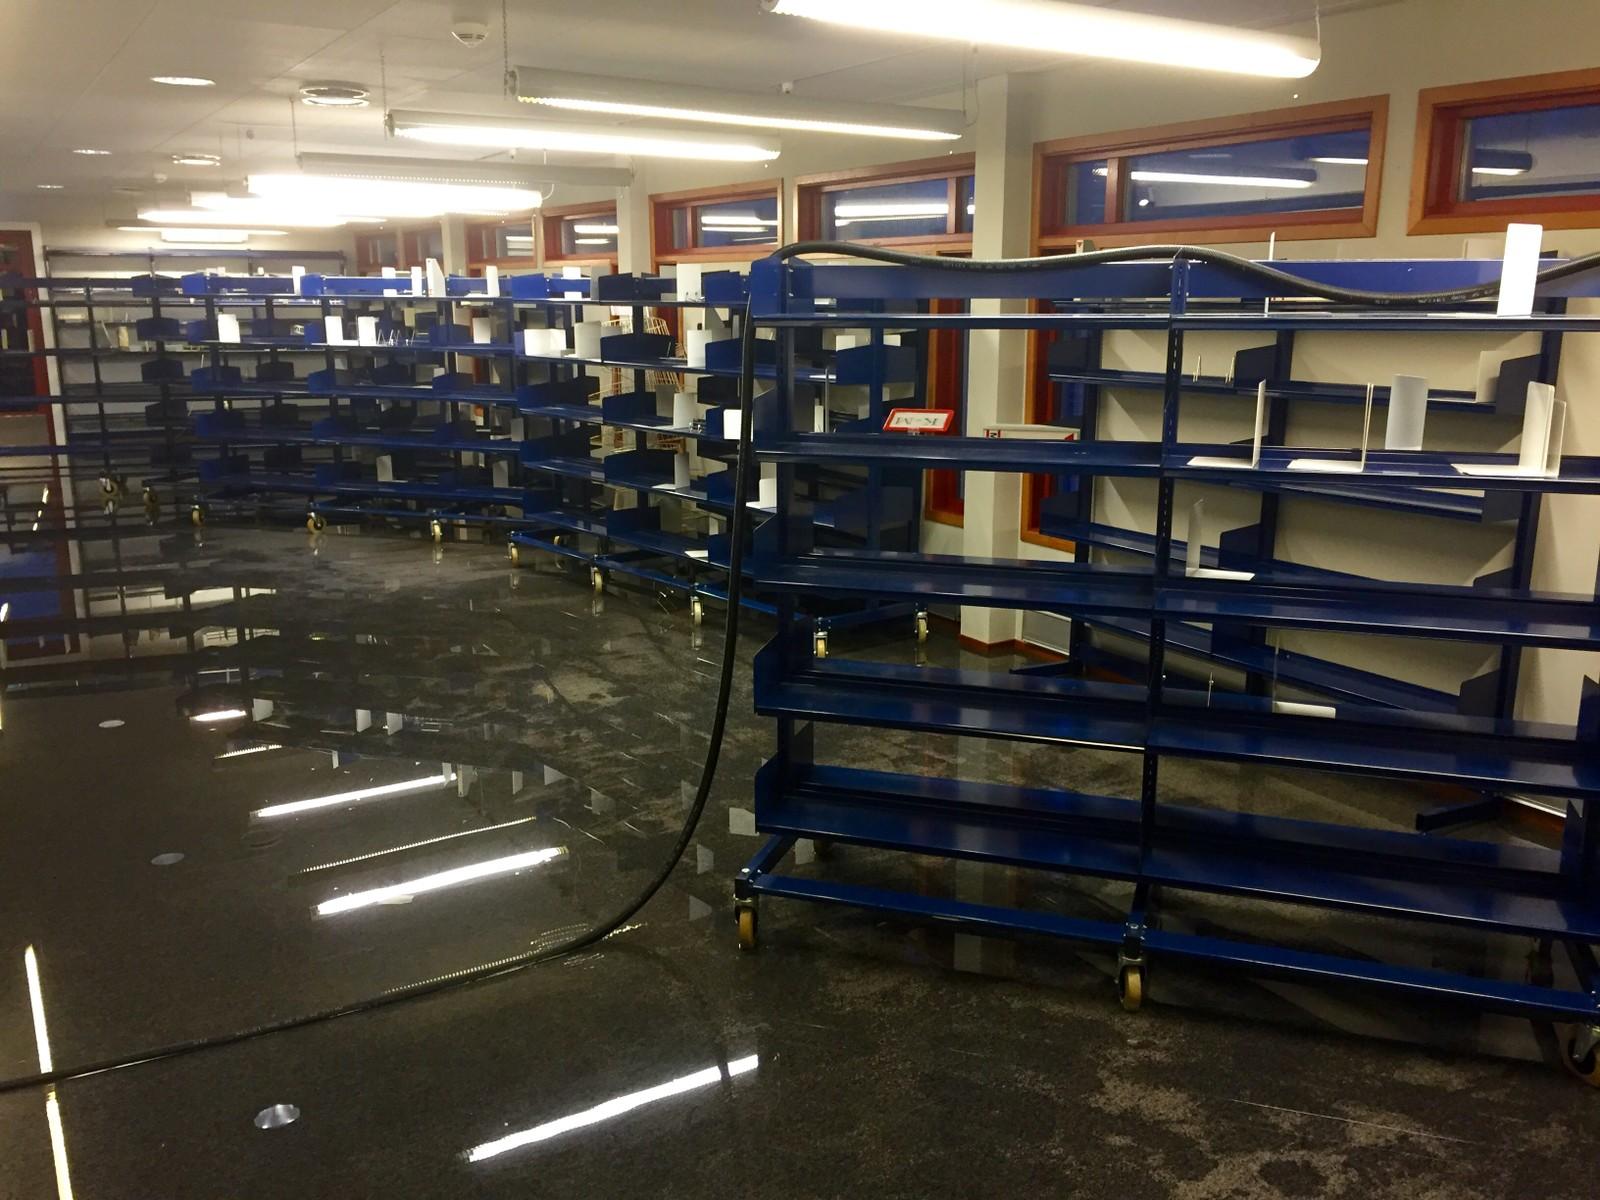 Oversvømmelse kulturhuset i Kvinesdal